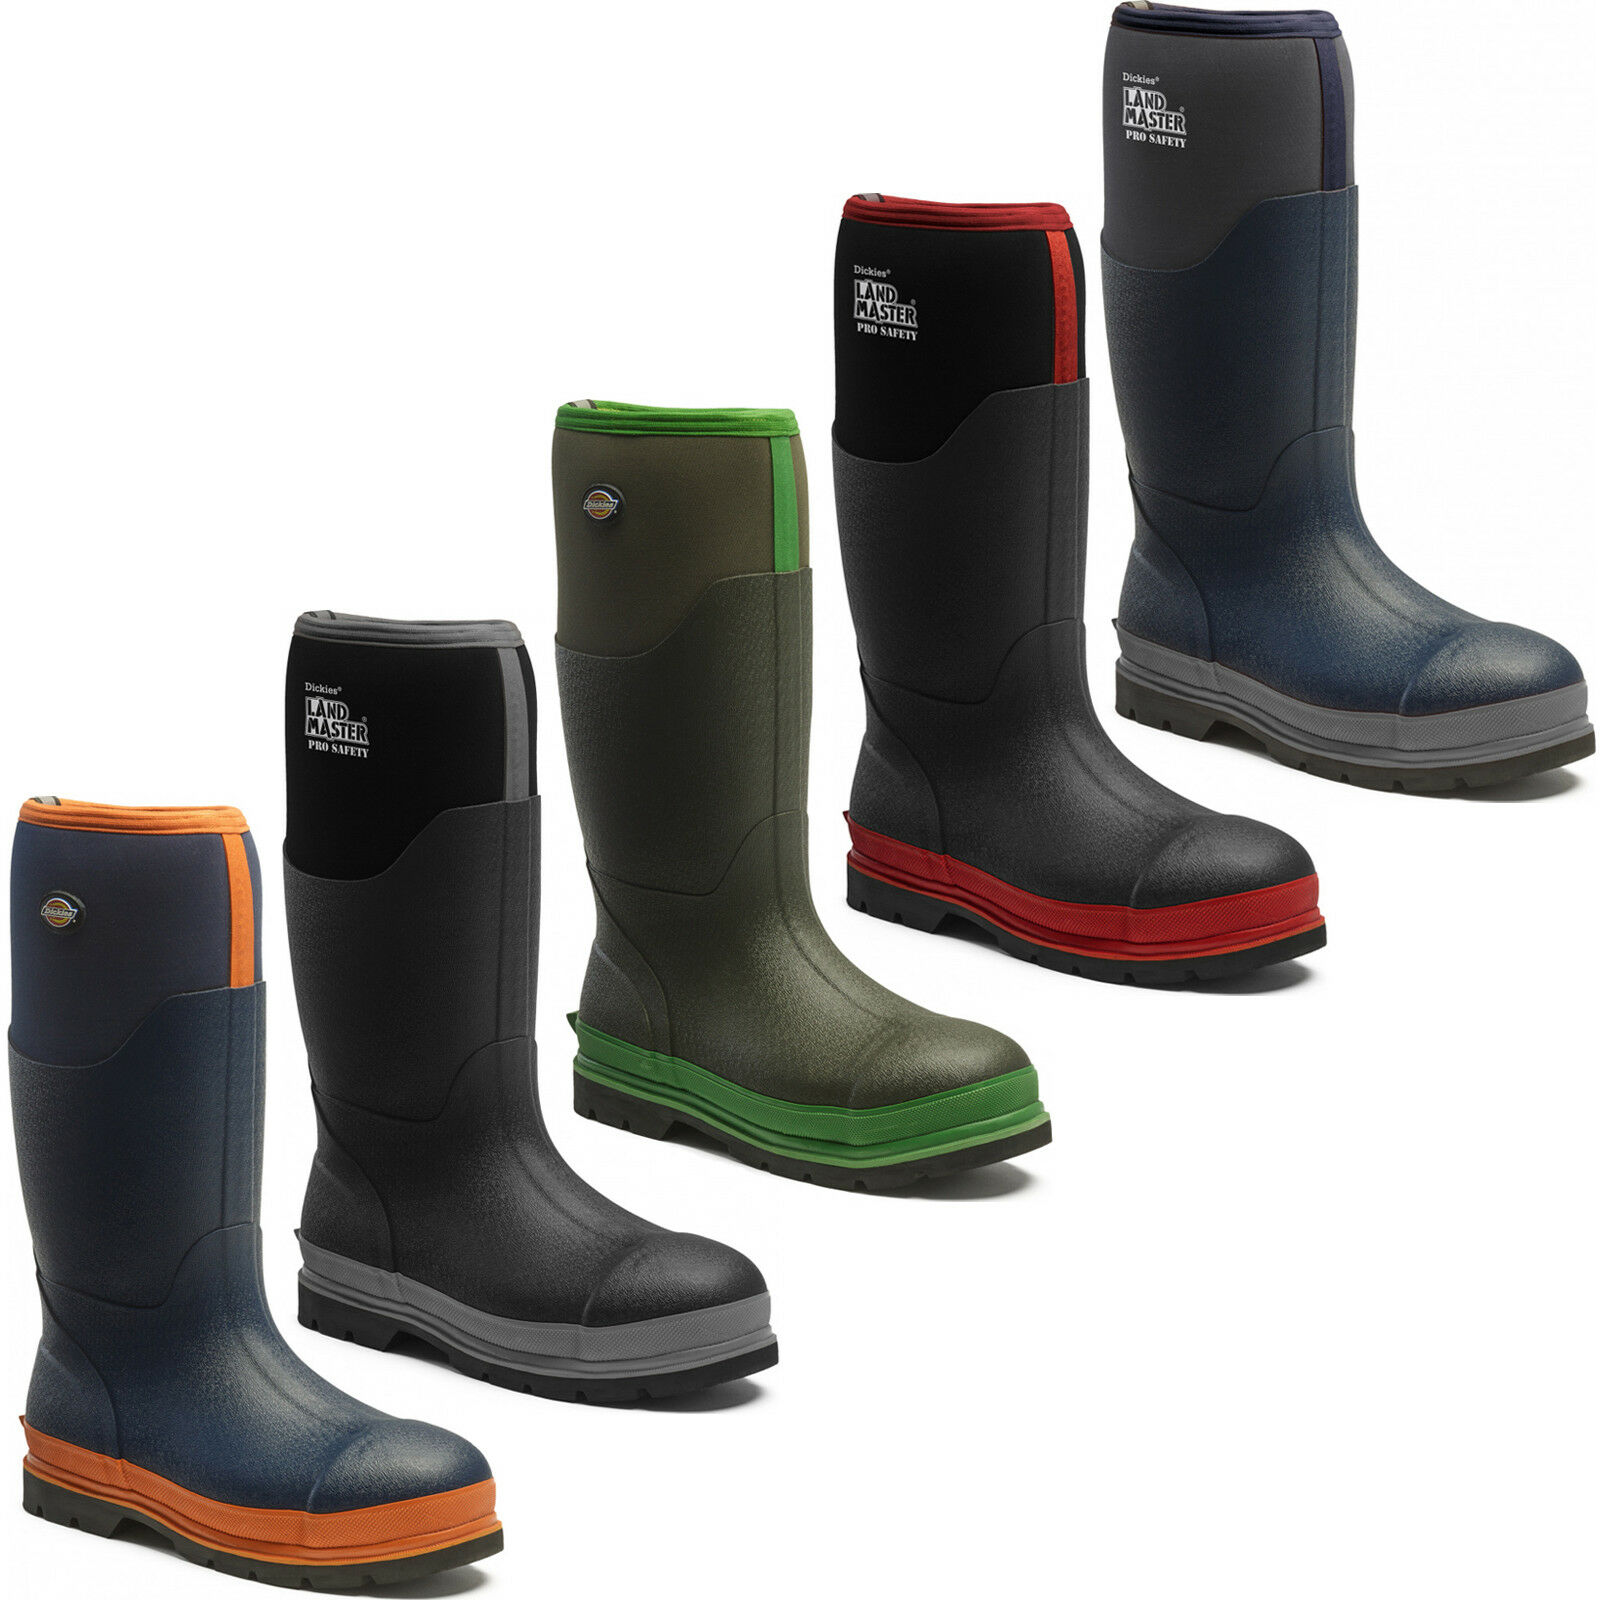 Dickies LANDMASTER Pro Impermeabile Sicurezza Stivali di uk6-12 gomma Acciaio Puntale Stivali uk6-12 di 569ff5